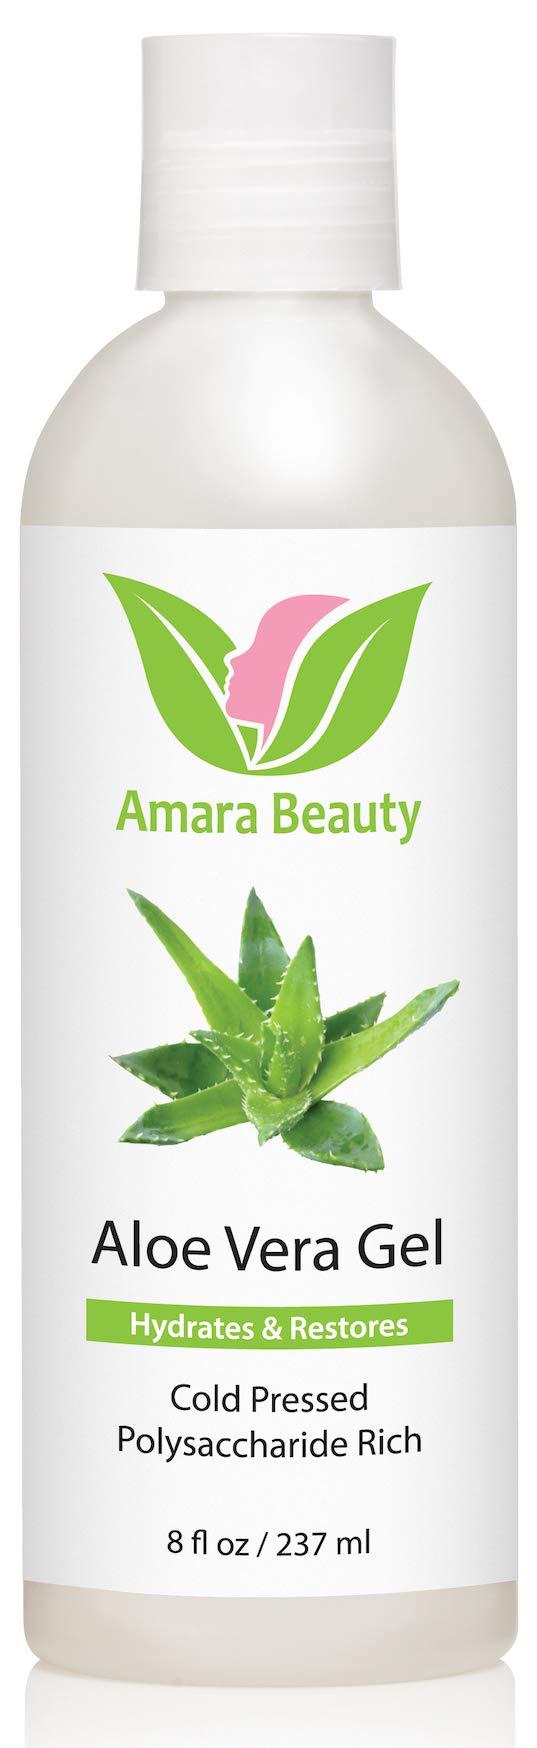 Aloe Vera Gel from Organic Cold Pressed Aloe, 8 fl. oz. by Amara Beauty